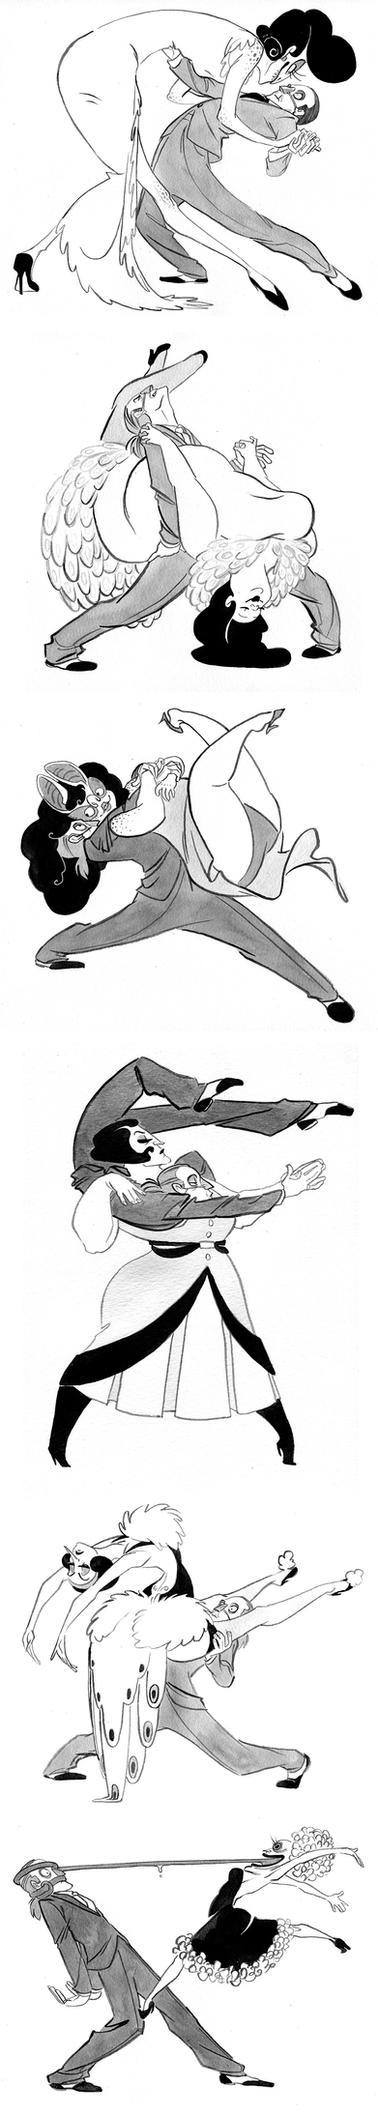 Dance Dump by Adoradora